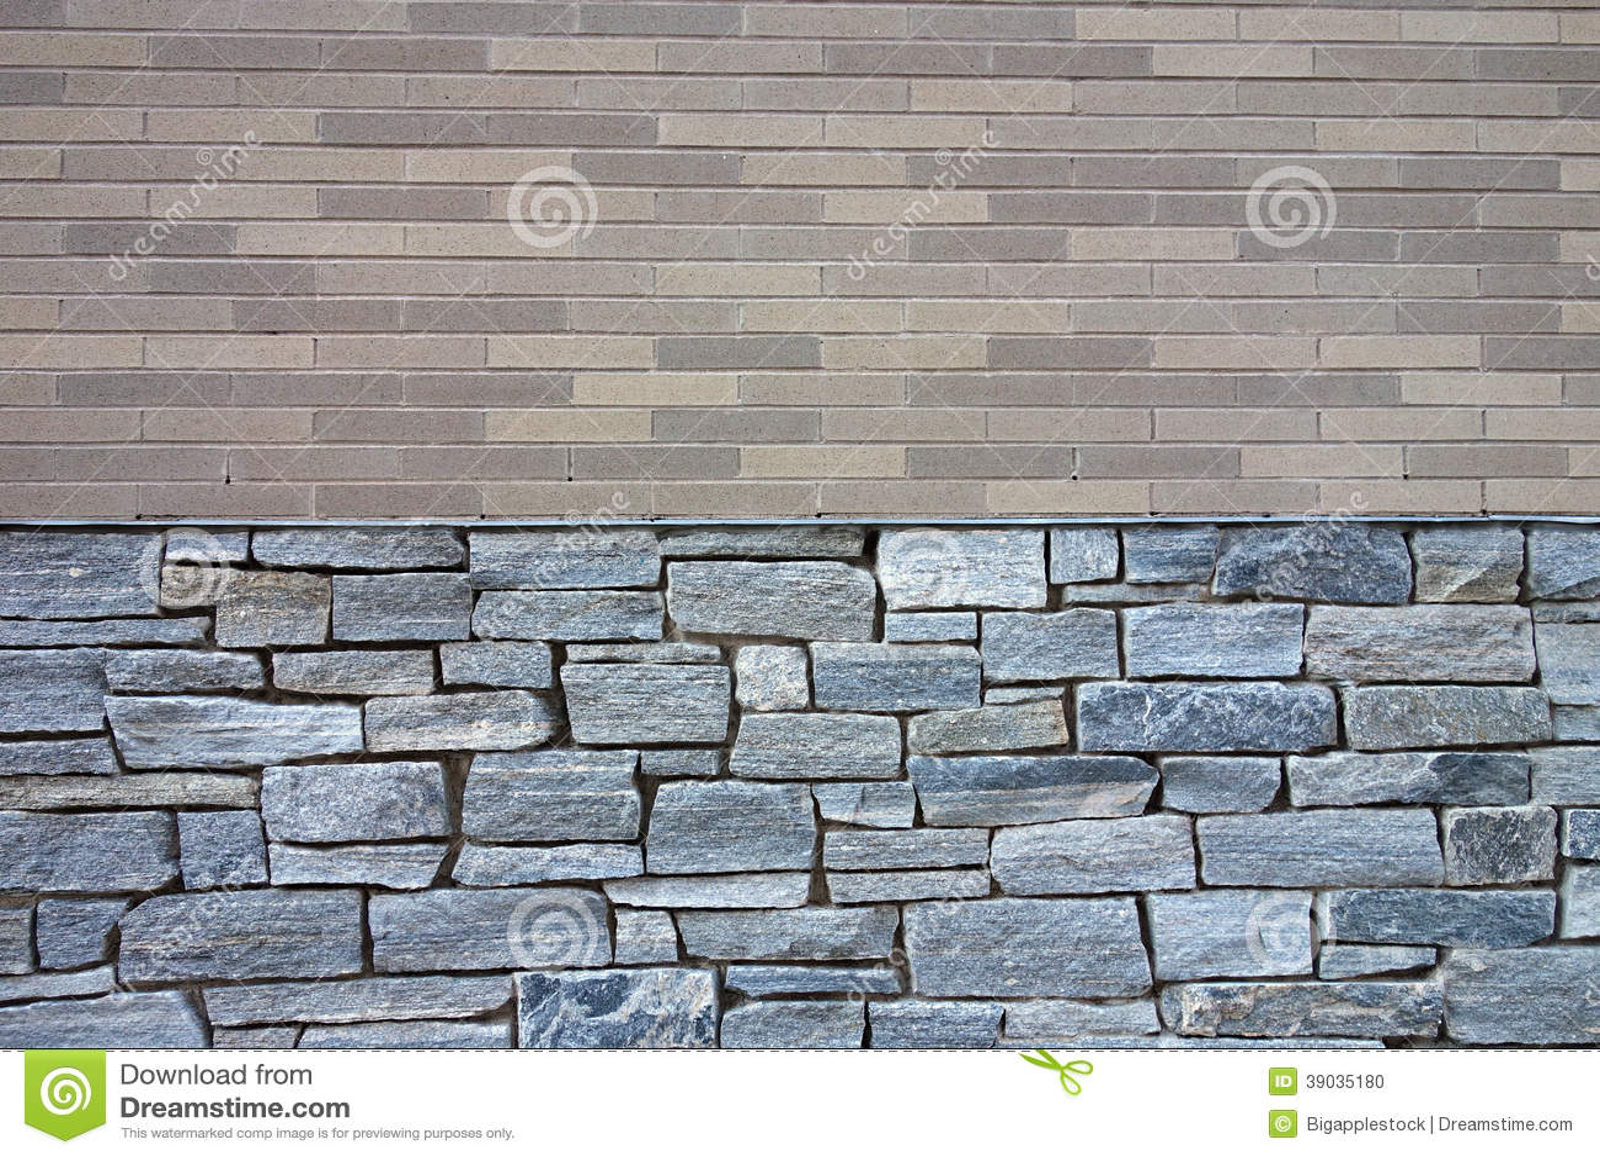 Brick And Stone Wall Stock Photo Image 39035180